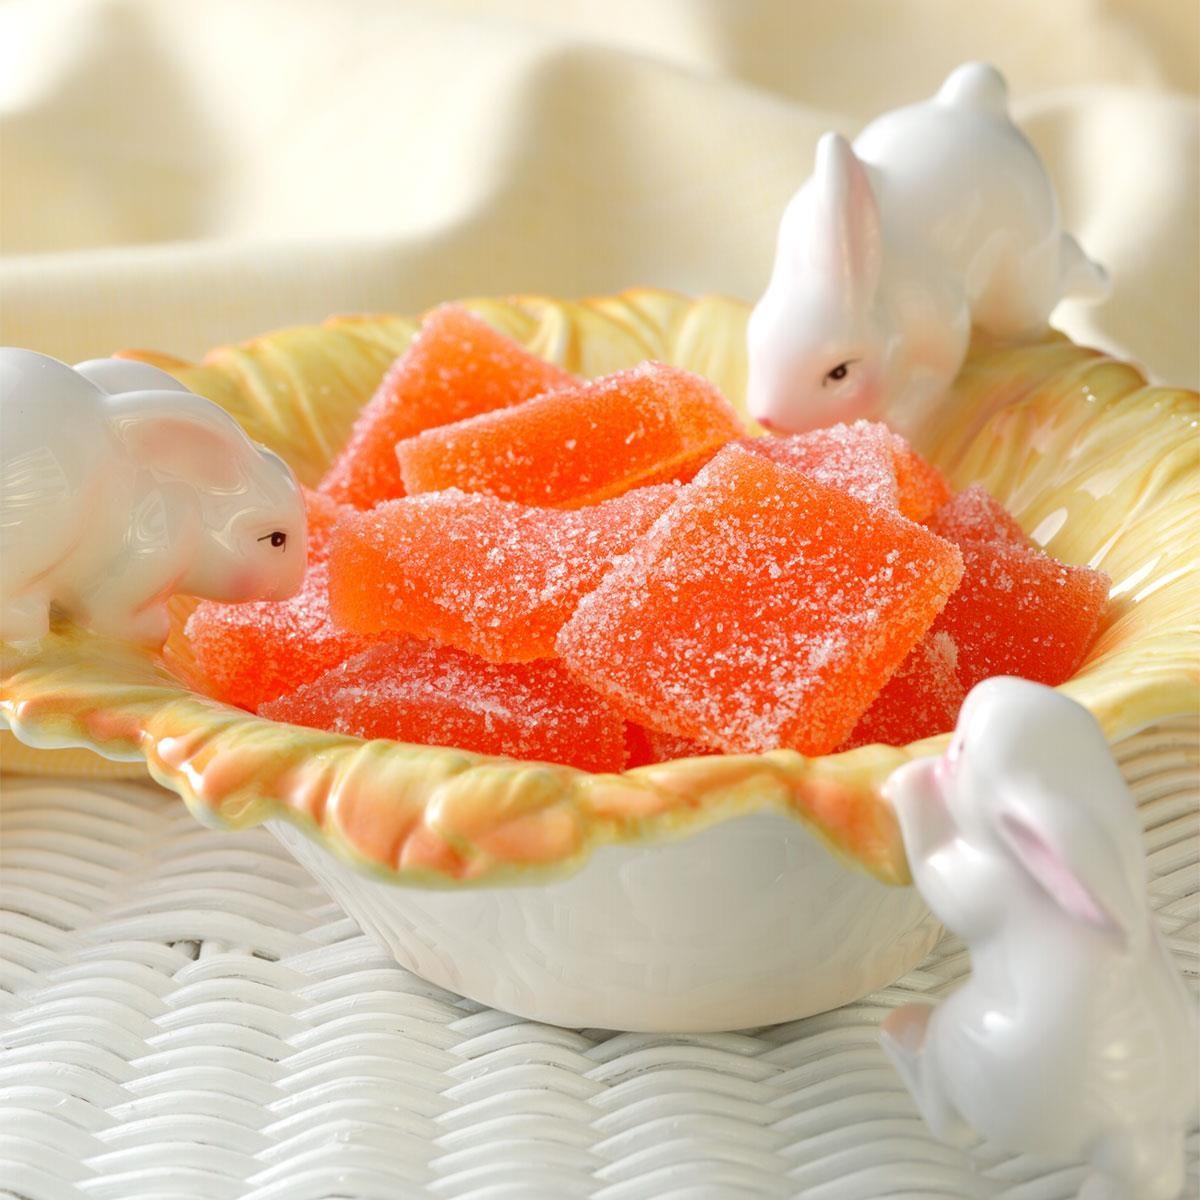 Chocolate Orange Peels Dunmore Candy Kitchen: Orange Jelly Candies Recipe